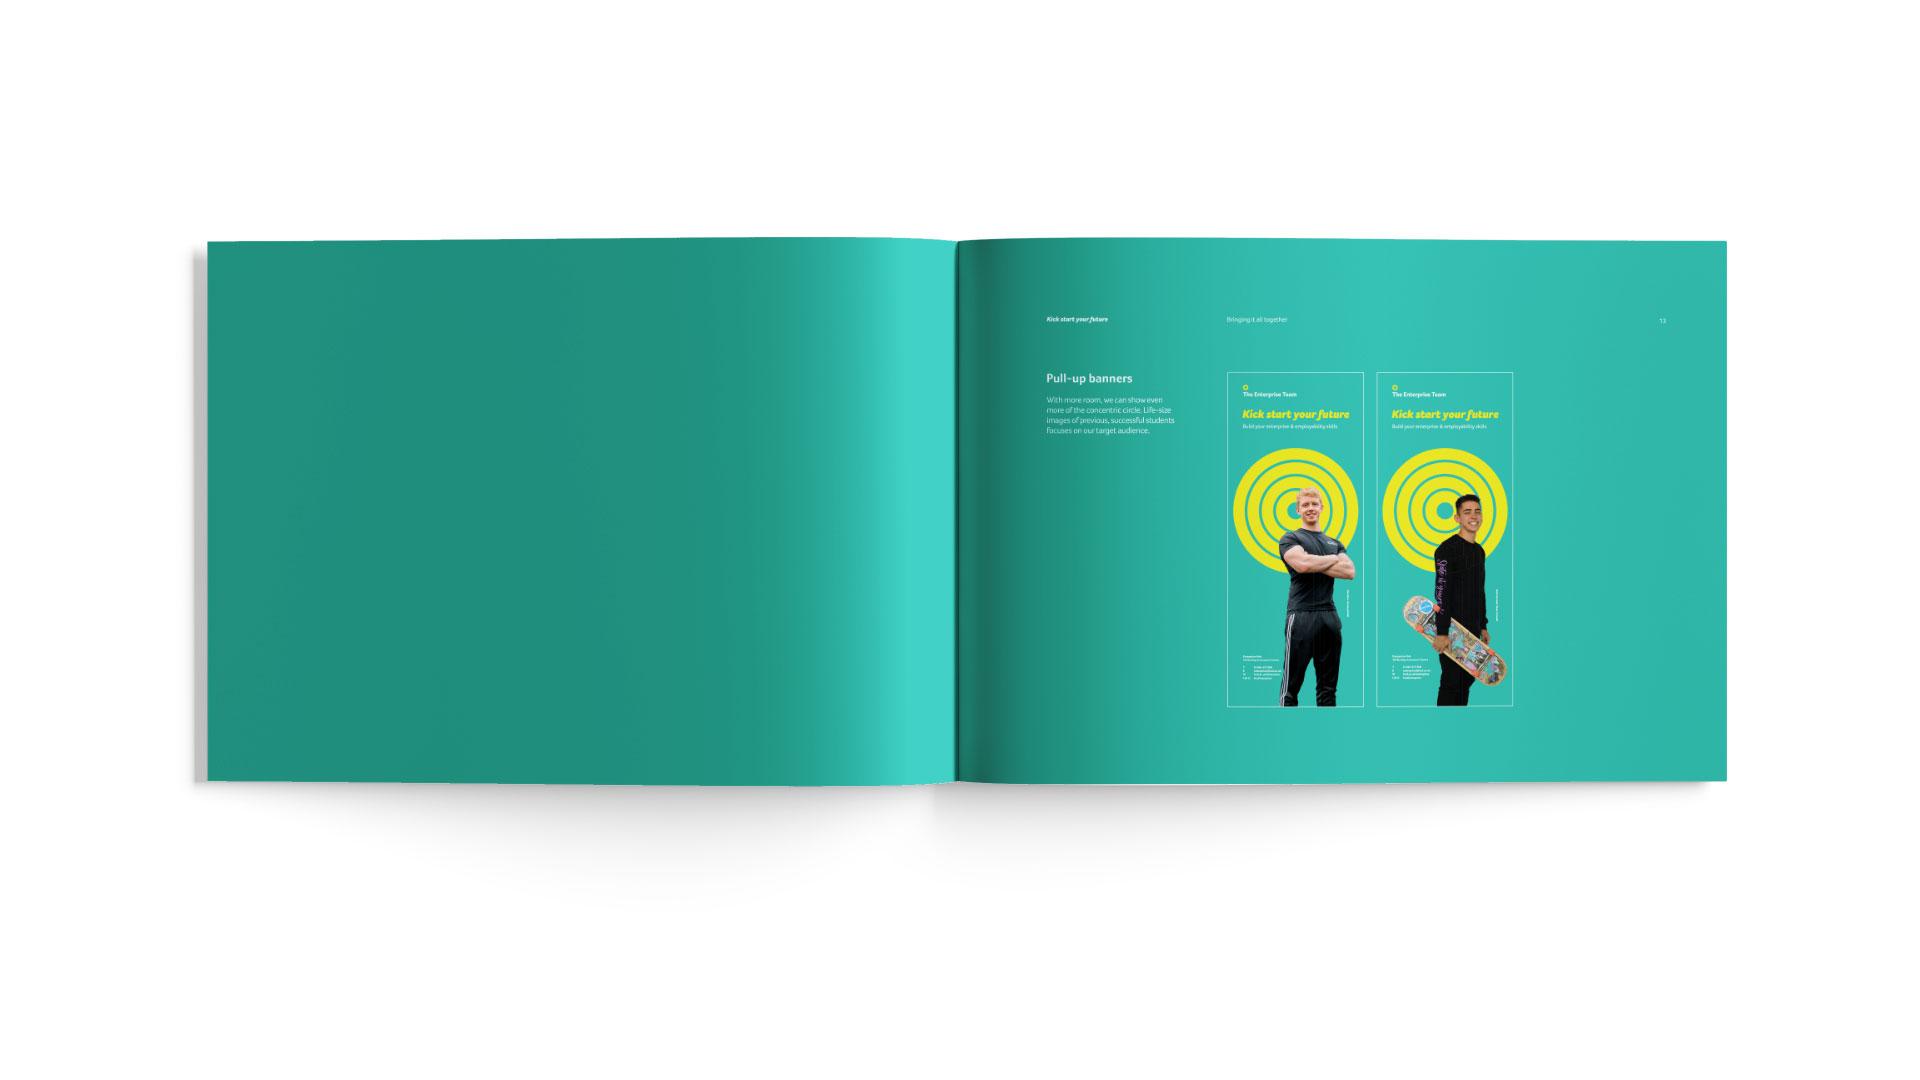 The-Enterprise-Team-Brand-Guides-Mock-Up-5